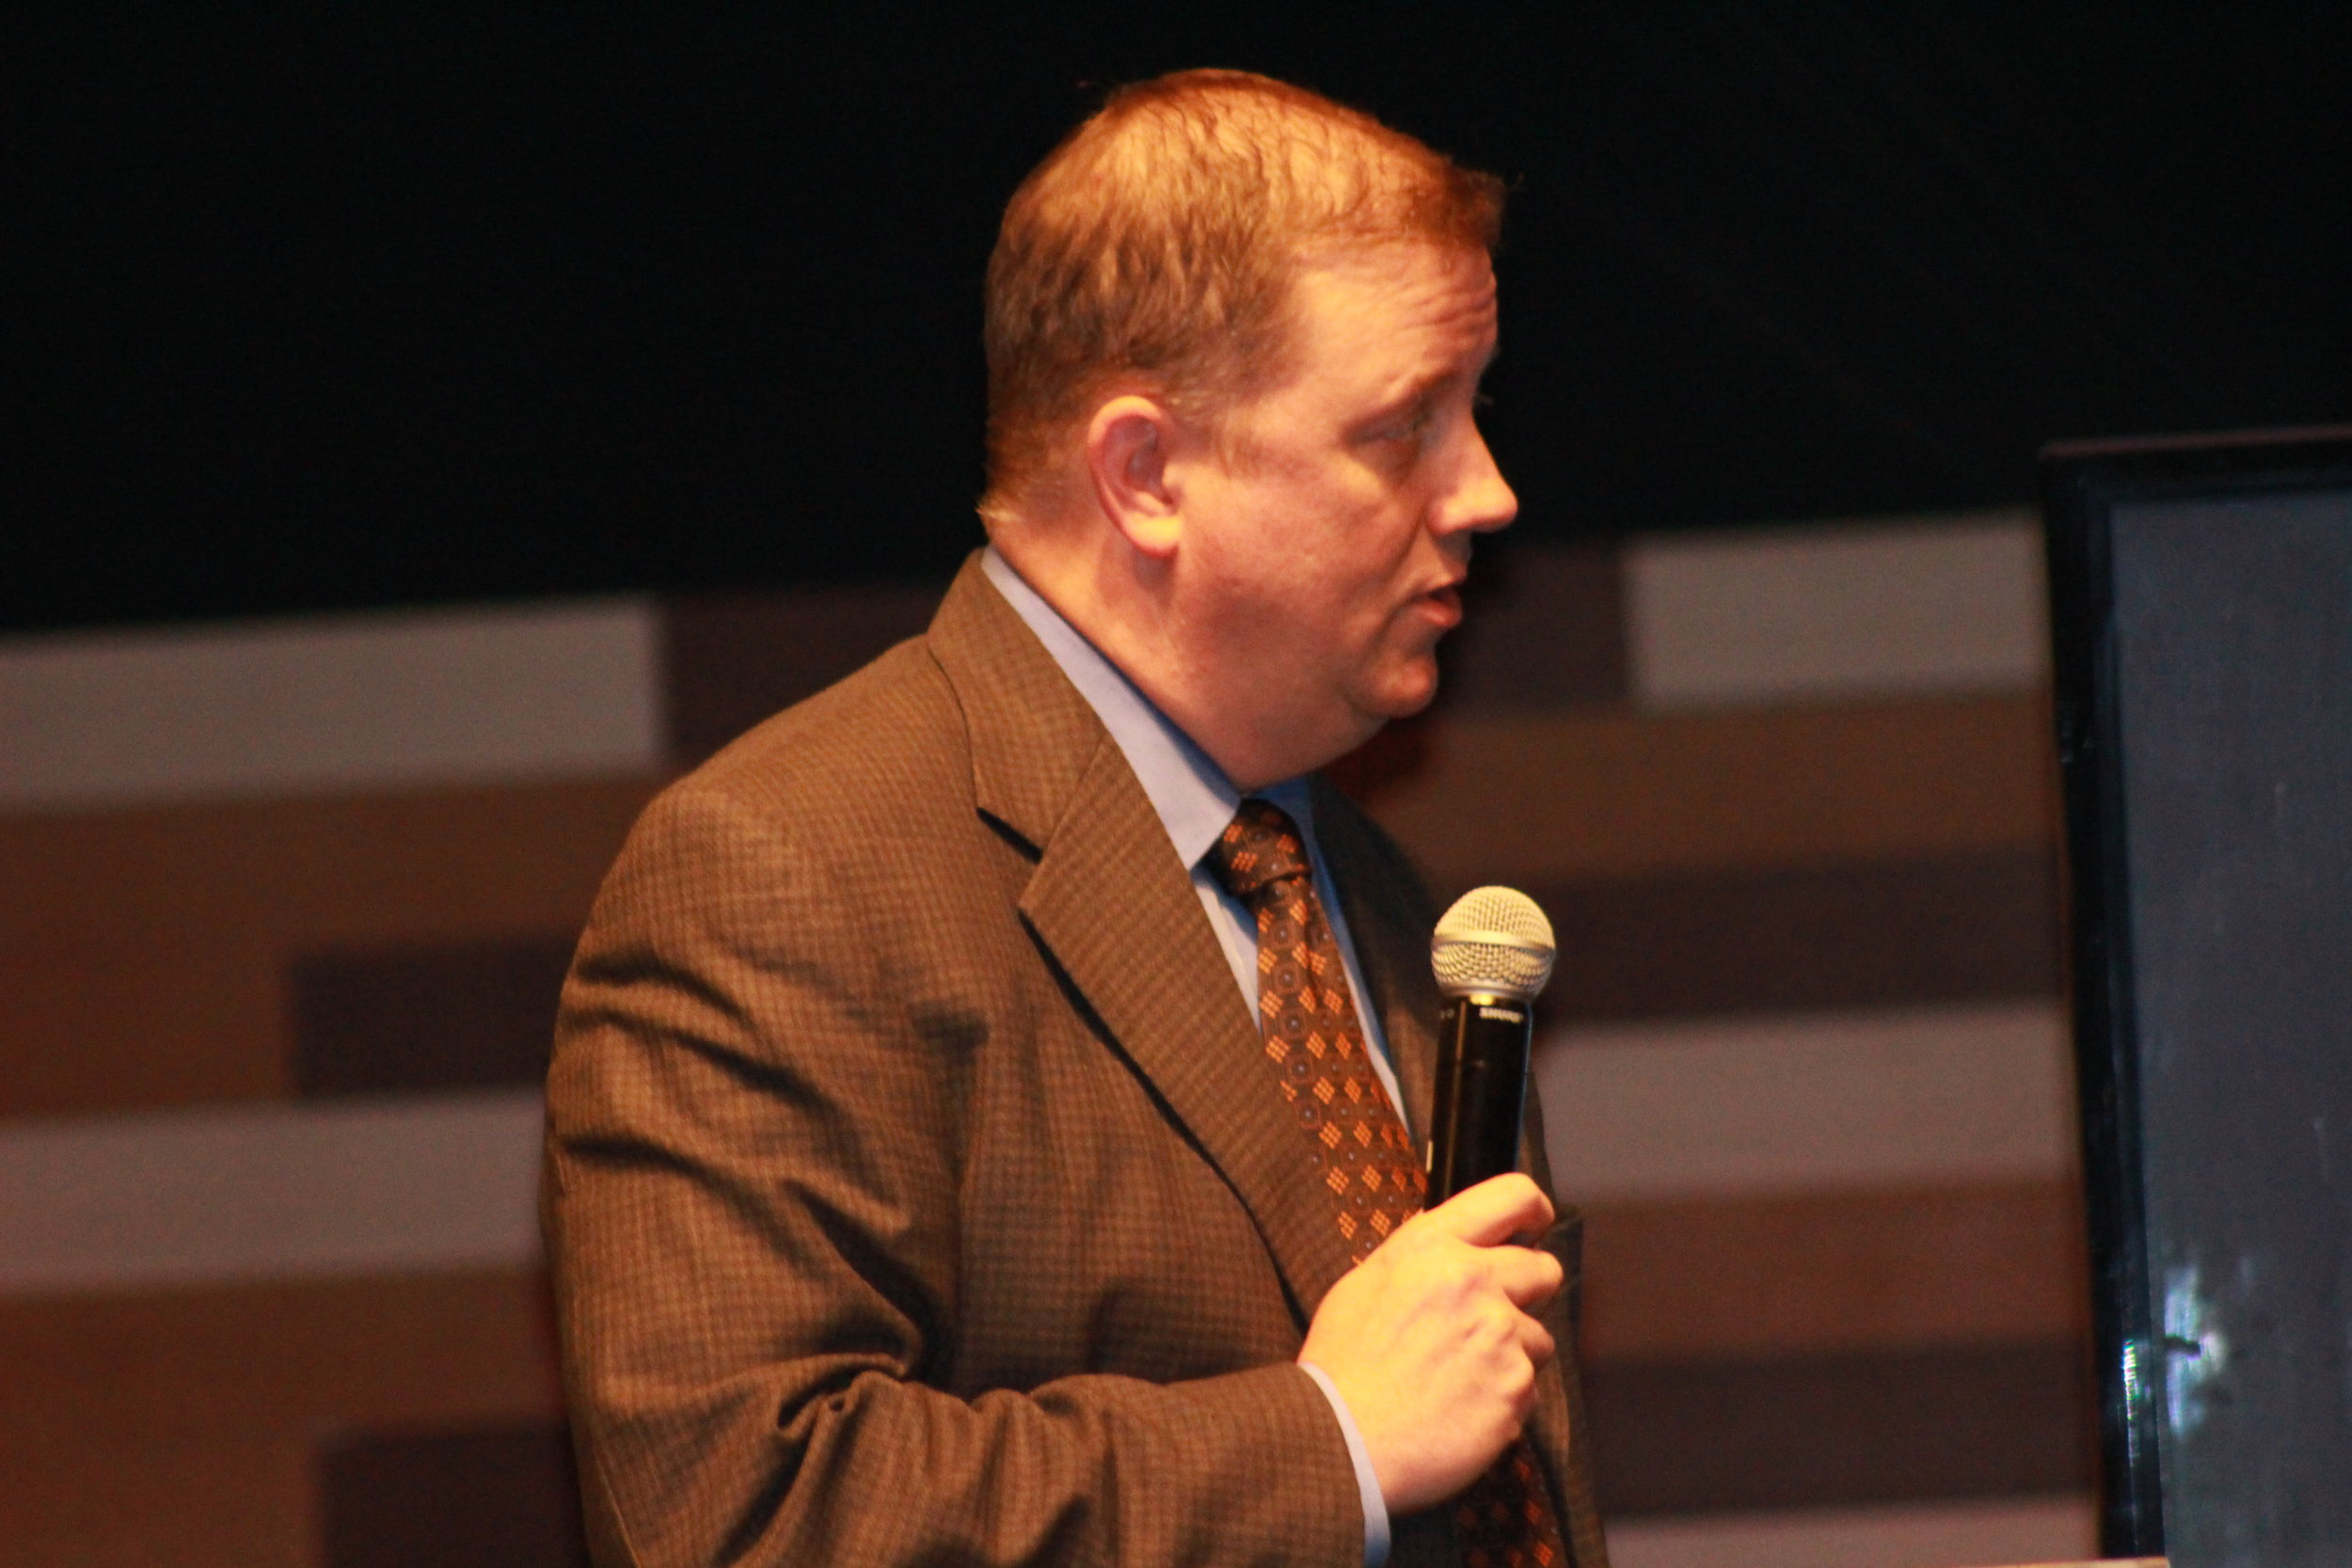 Senator Dan Newberry has resigned his seat, effective January 31, 2018.